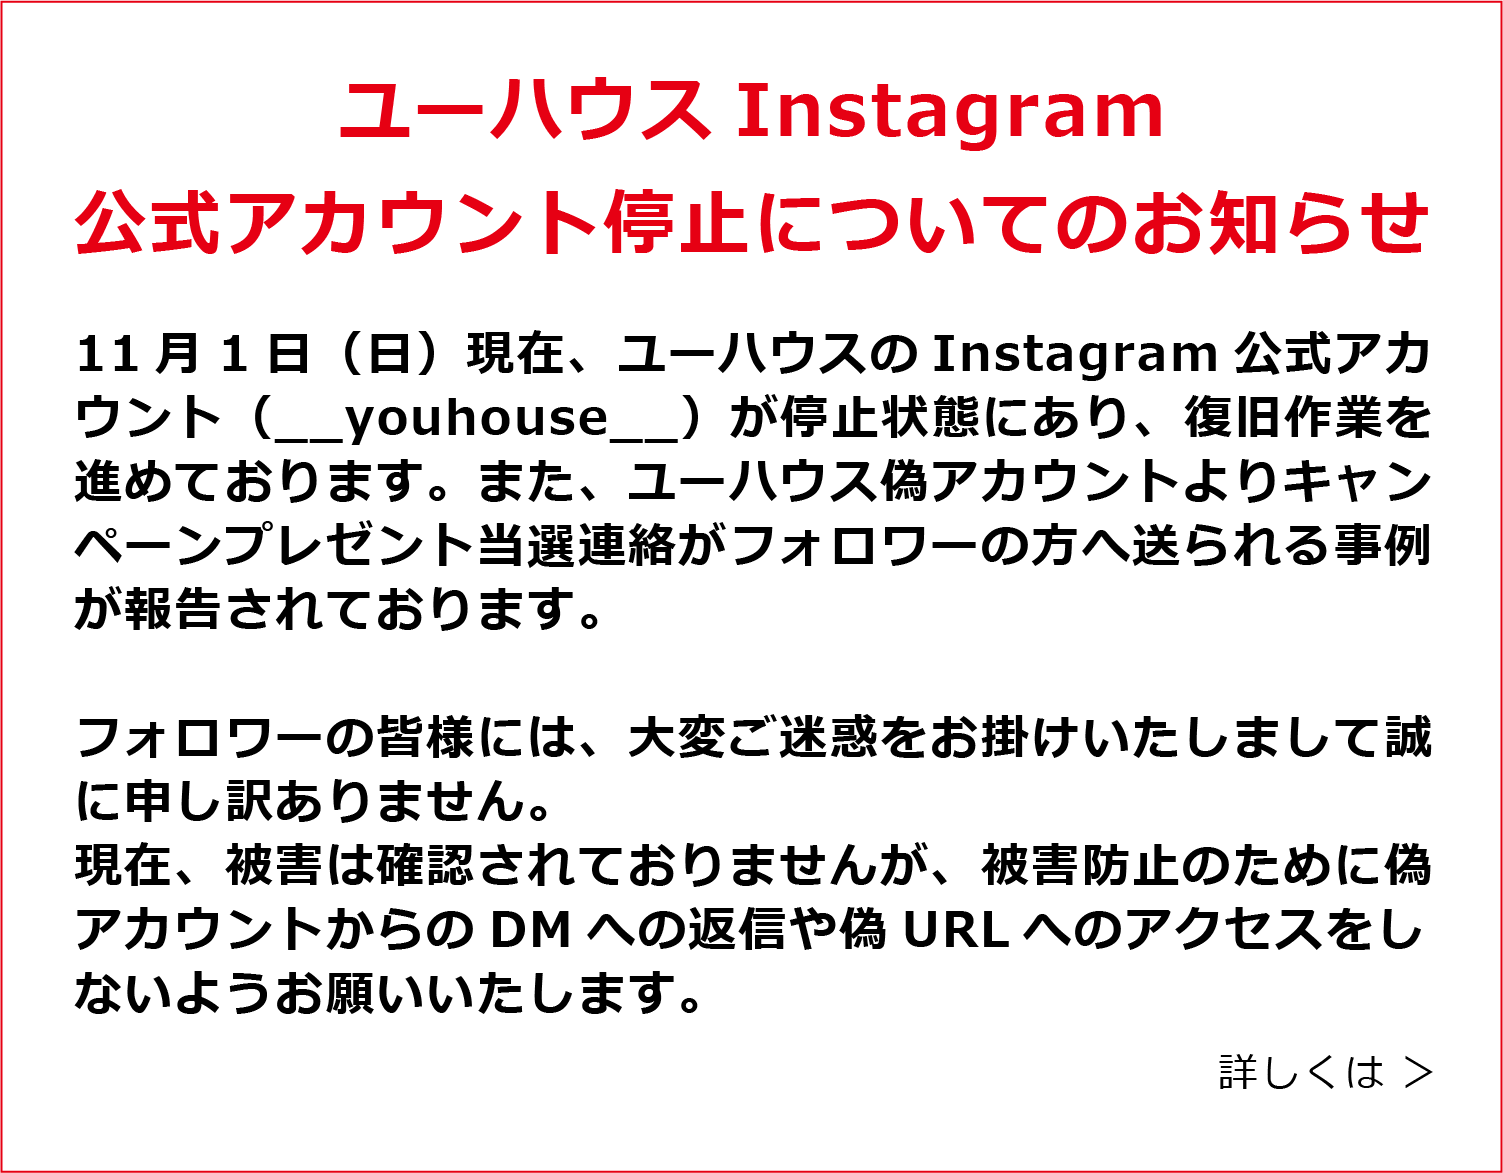 Instagram偽アカウントにご注意ください